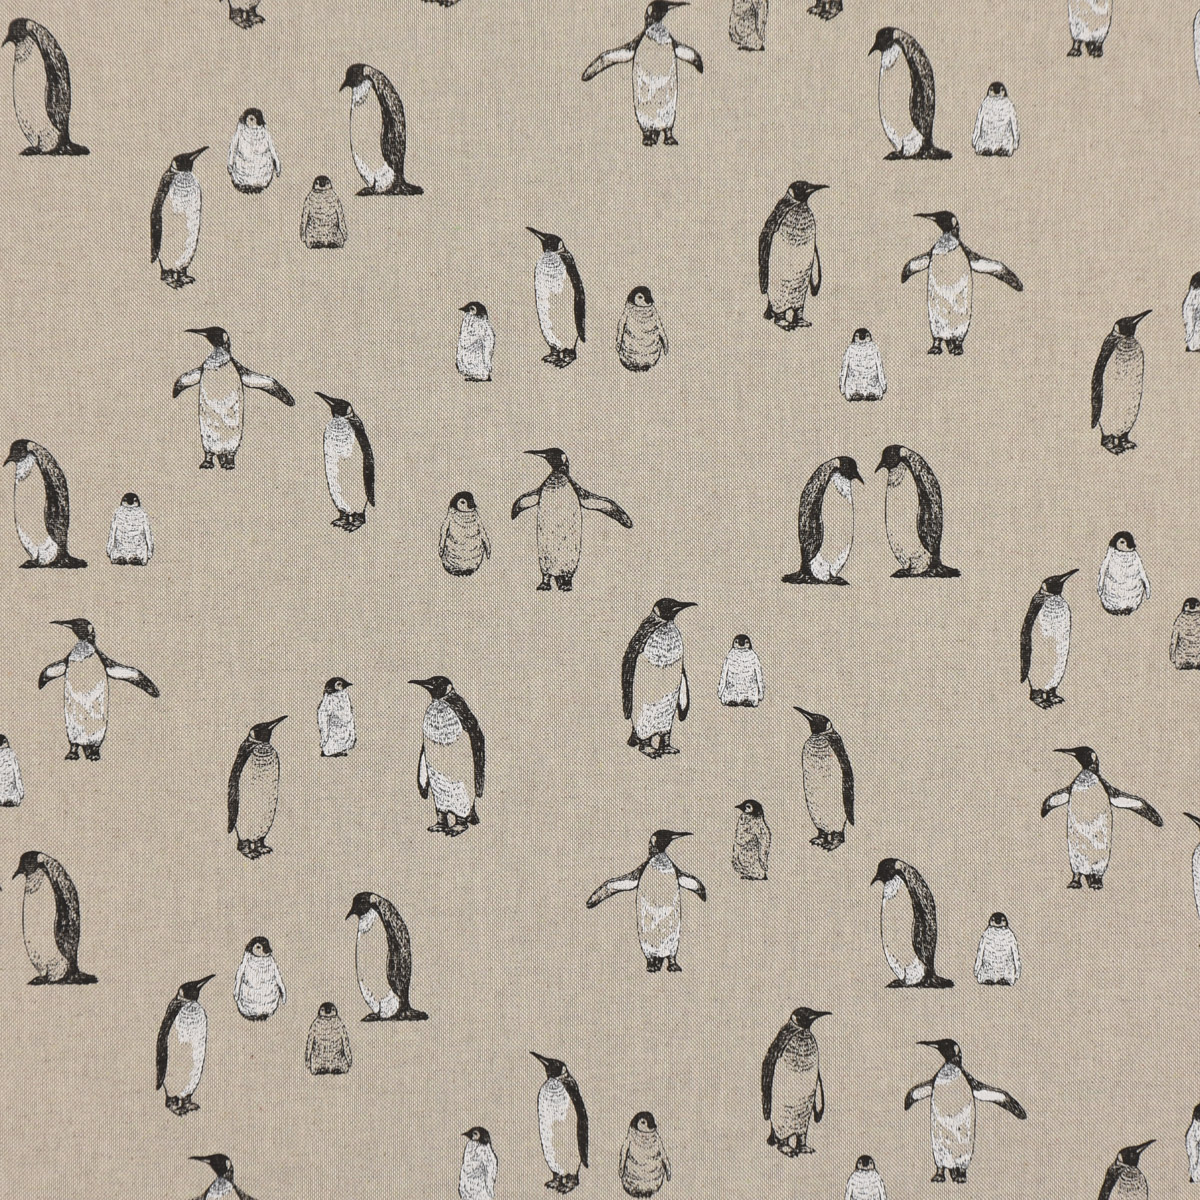 Dekostoff Halbpanama Leinenlook Pinguine Pinguinfamilie natur schwarz 1,40m Breite